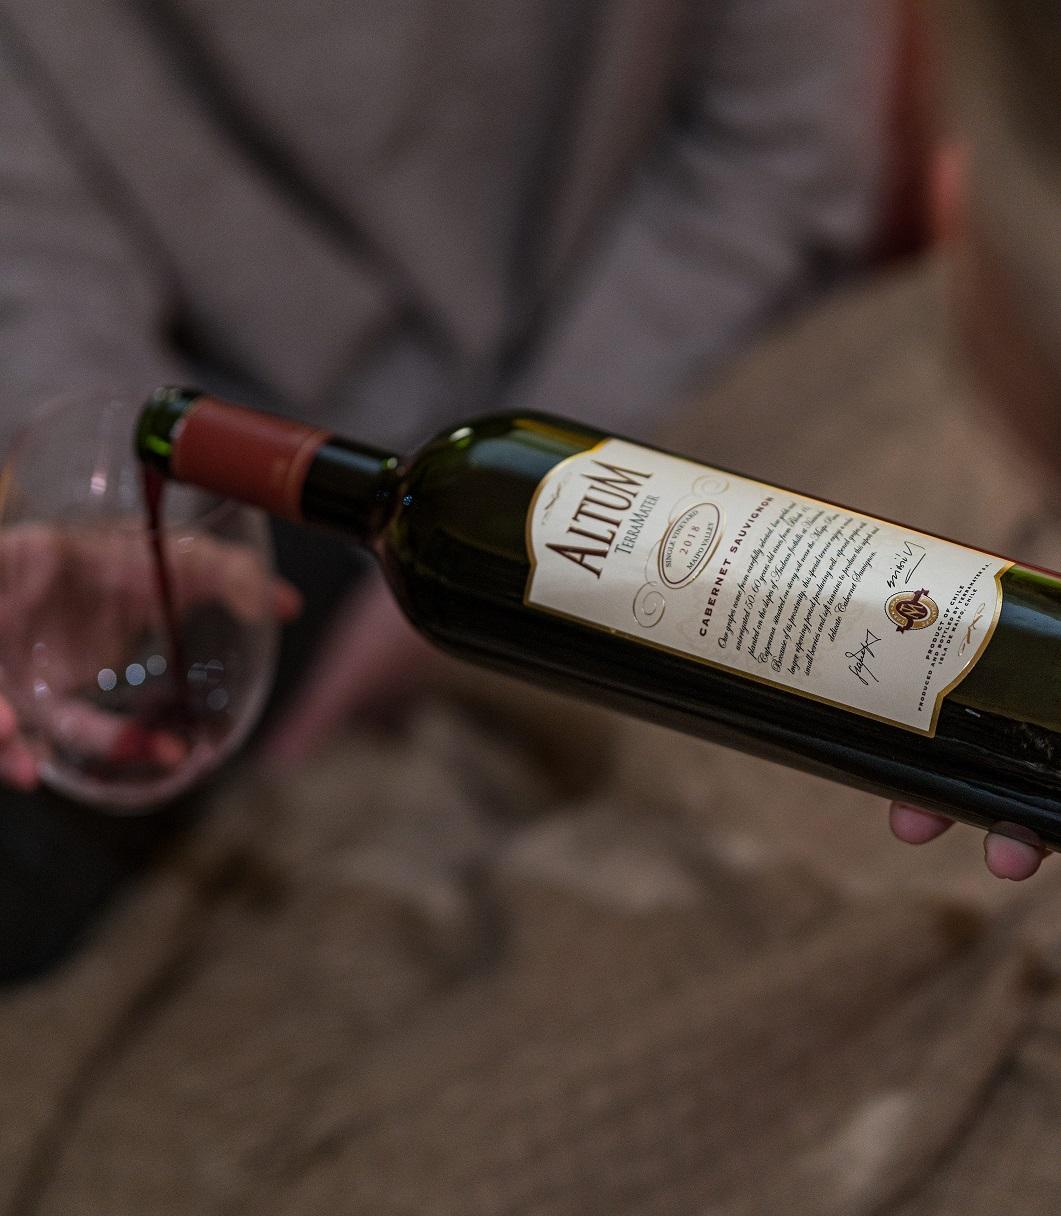 Ideal para brindar: Altum Cabernet Sauvignon de Viña Terramater